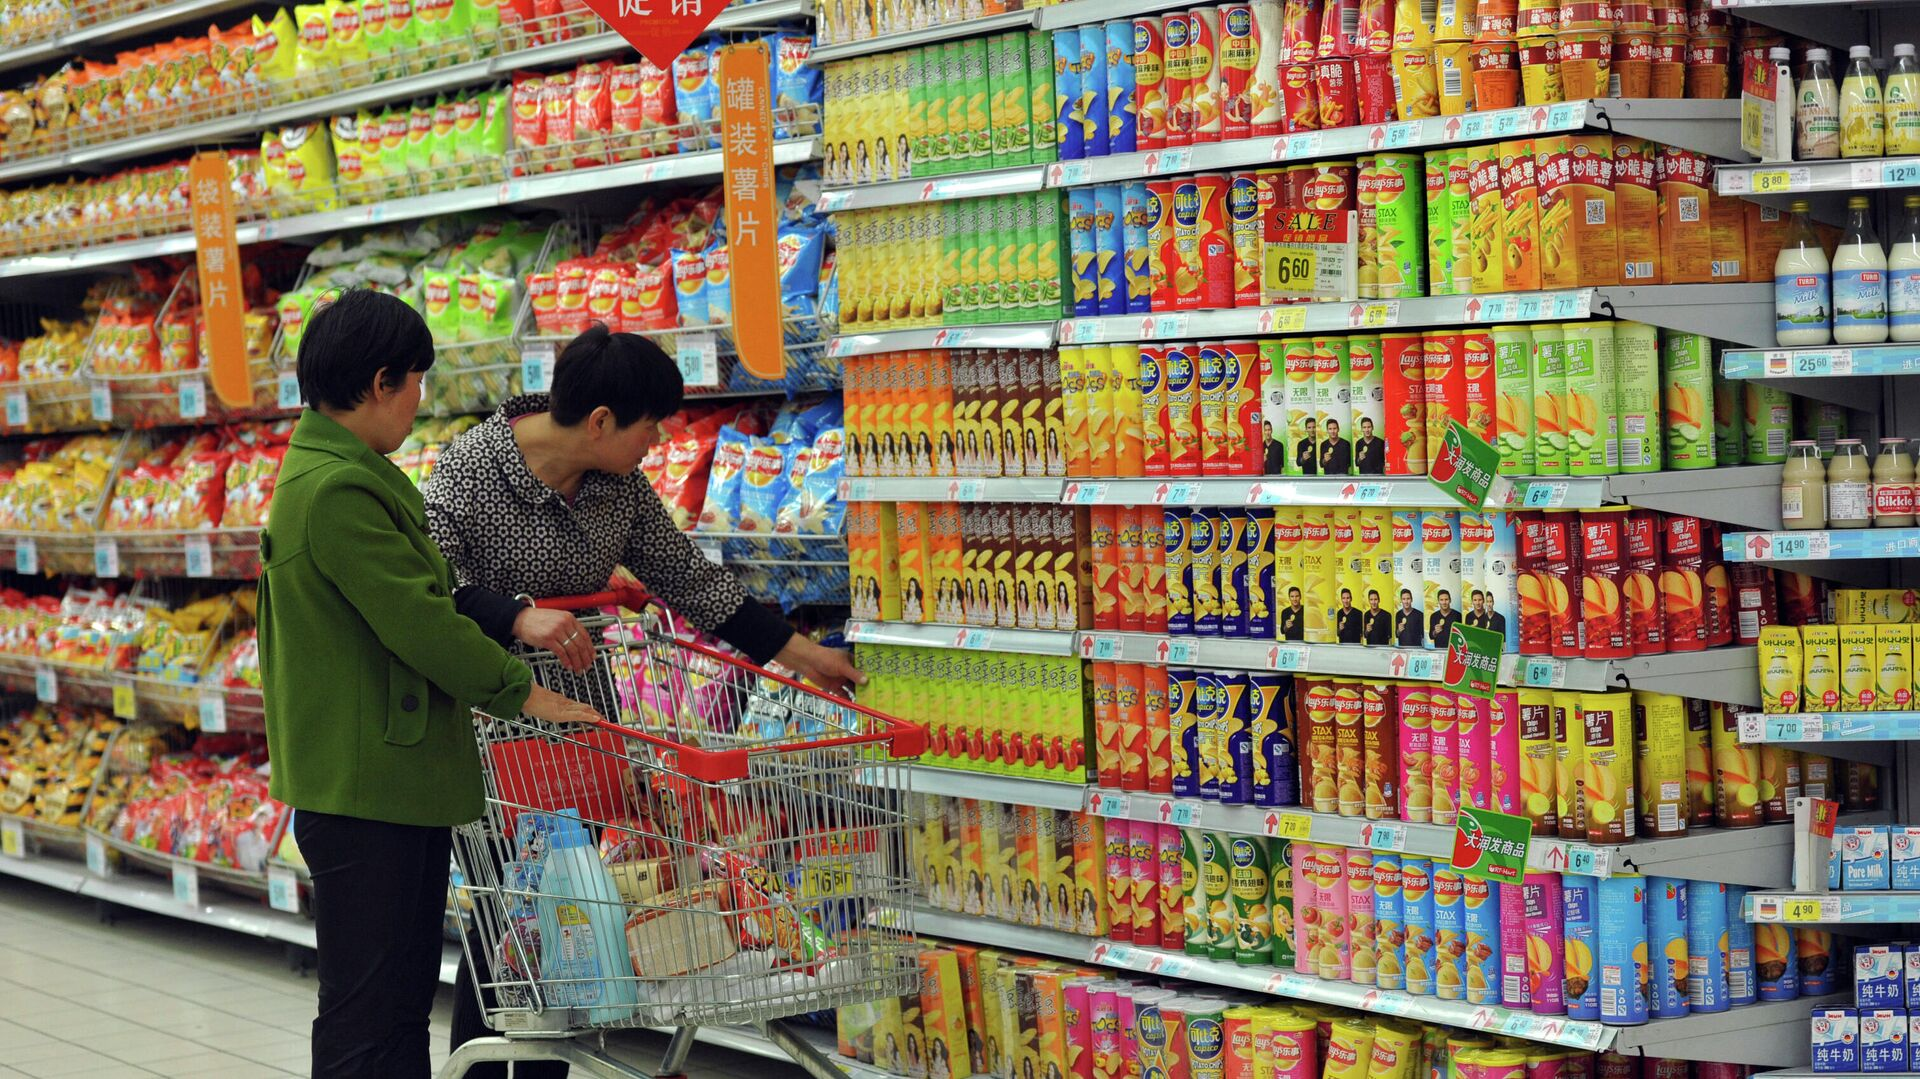 Покупатели в супермаркете в городе Фуян, Китай - РИА Новости, 1920, 23.01.2020